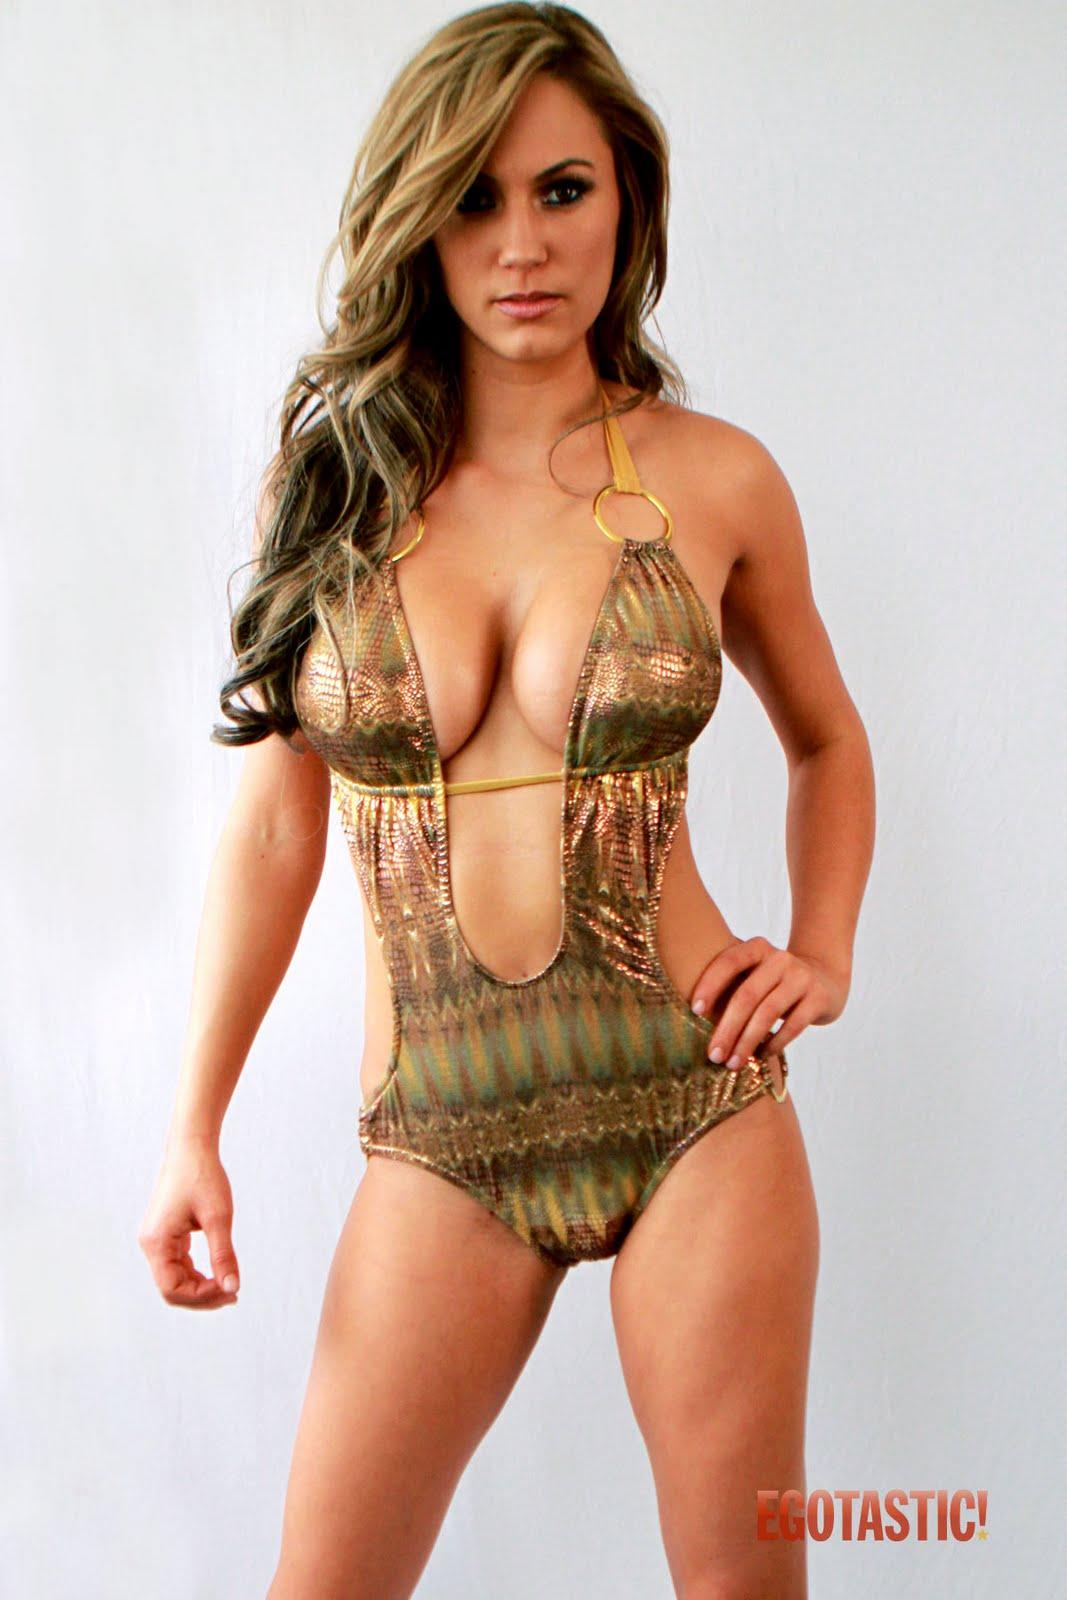 chelsea costa egotastic shoot gold bikini 01 ... State Senator Peterson, Fairfax Chair Sharon Bulova and Fairfax County ...